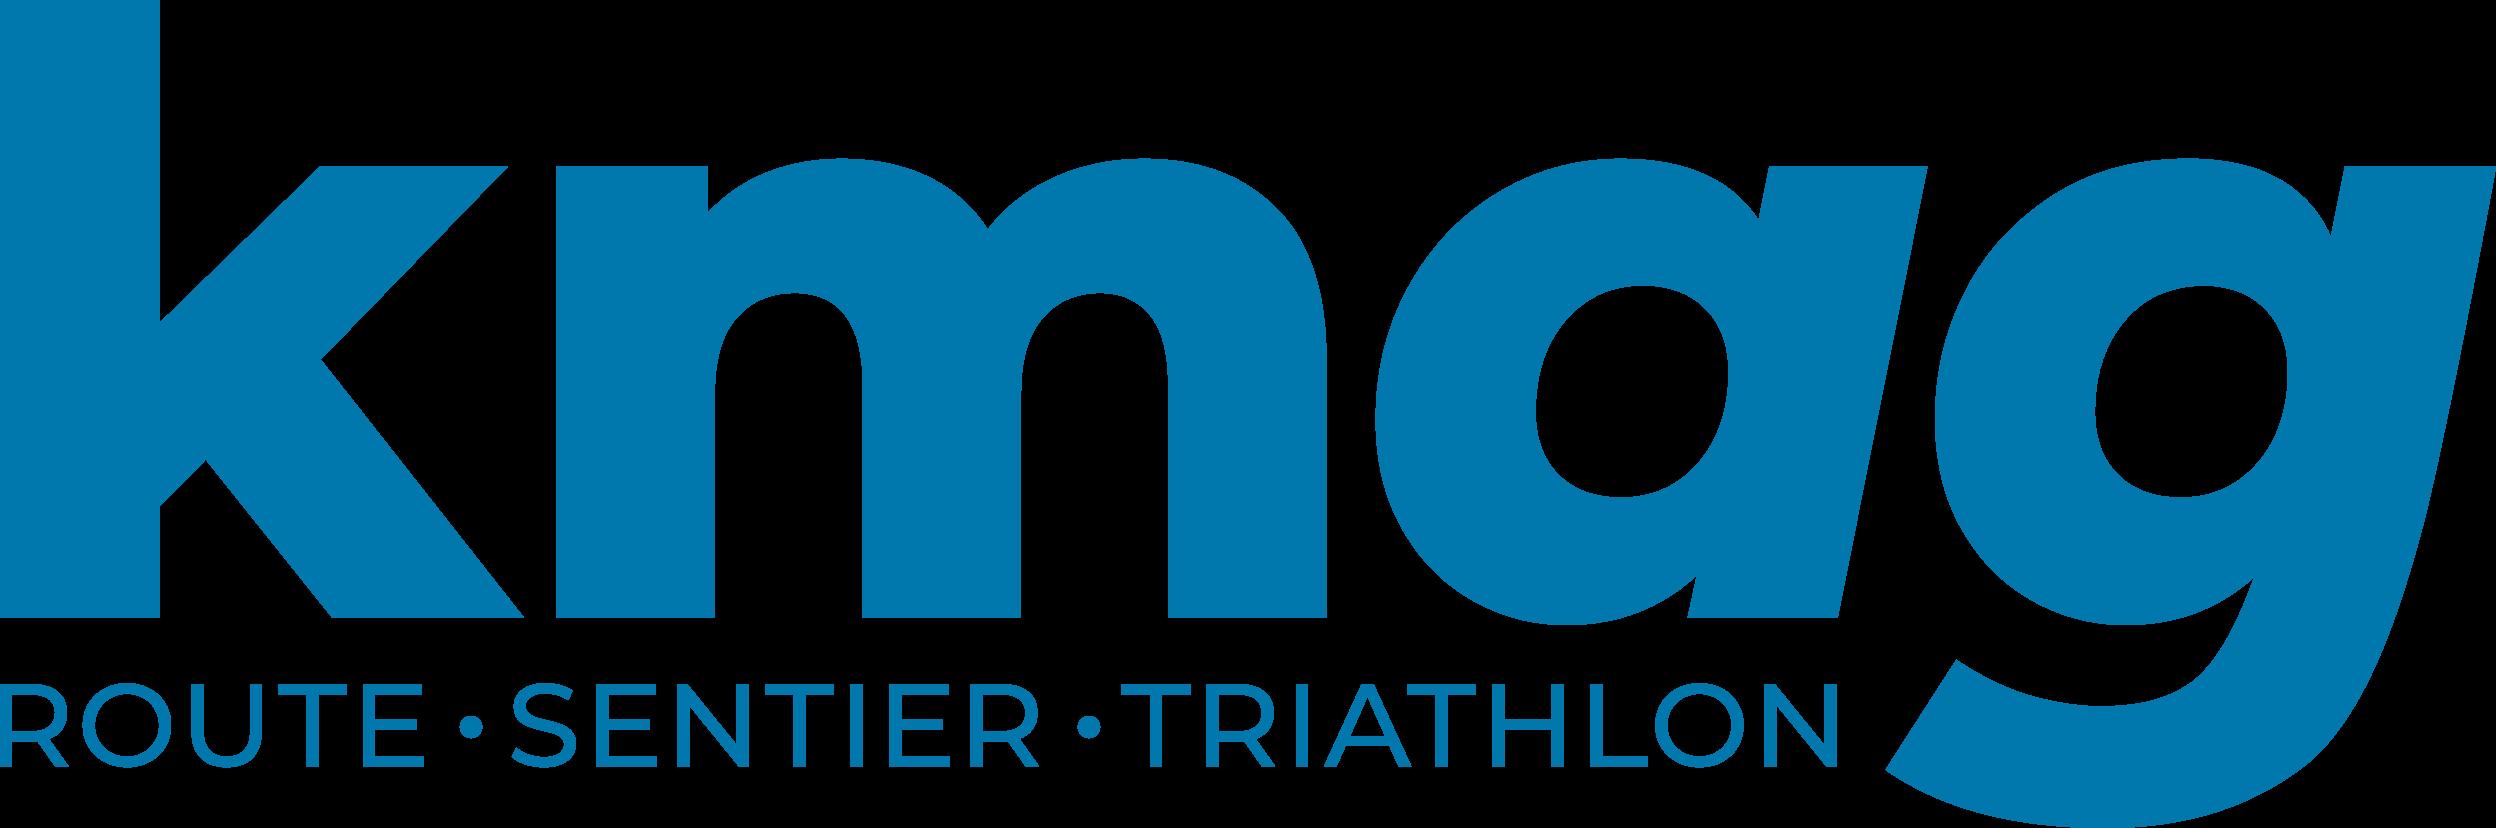 Logo - KMAG